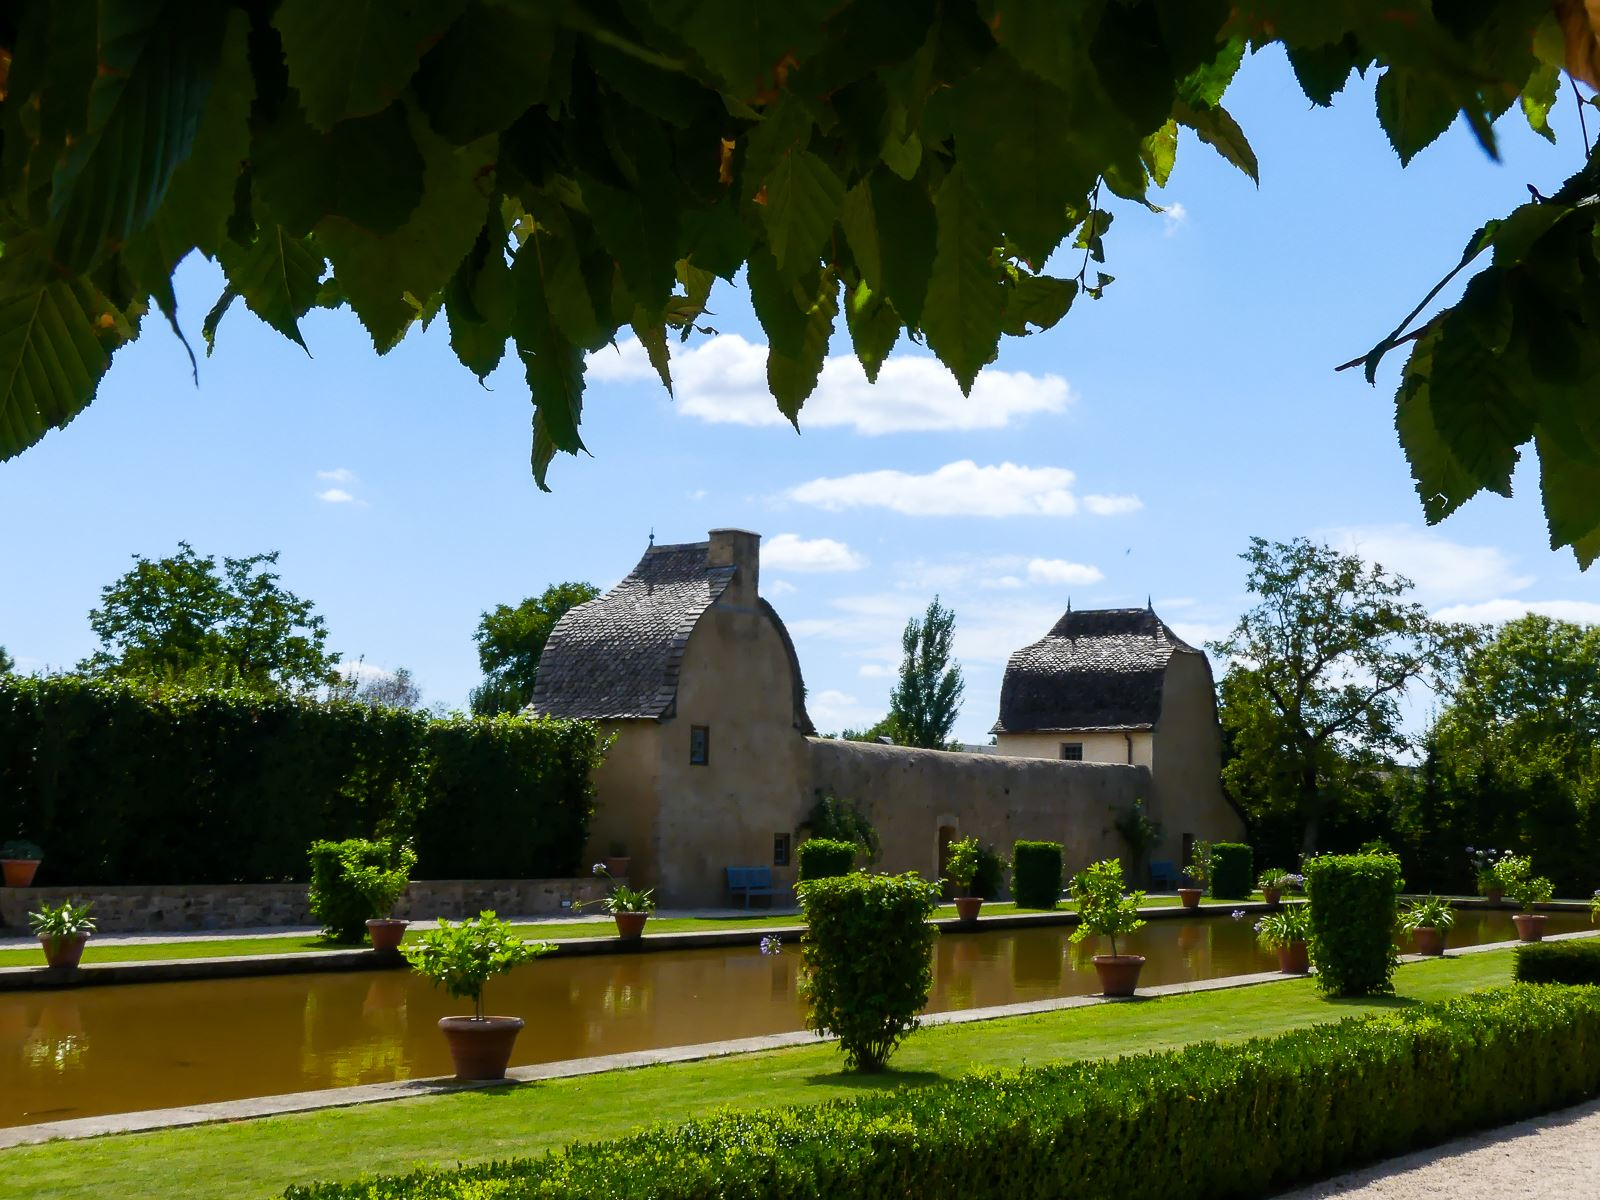 Jardins du château de Bournazel - Aveyron